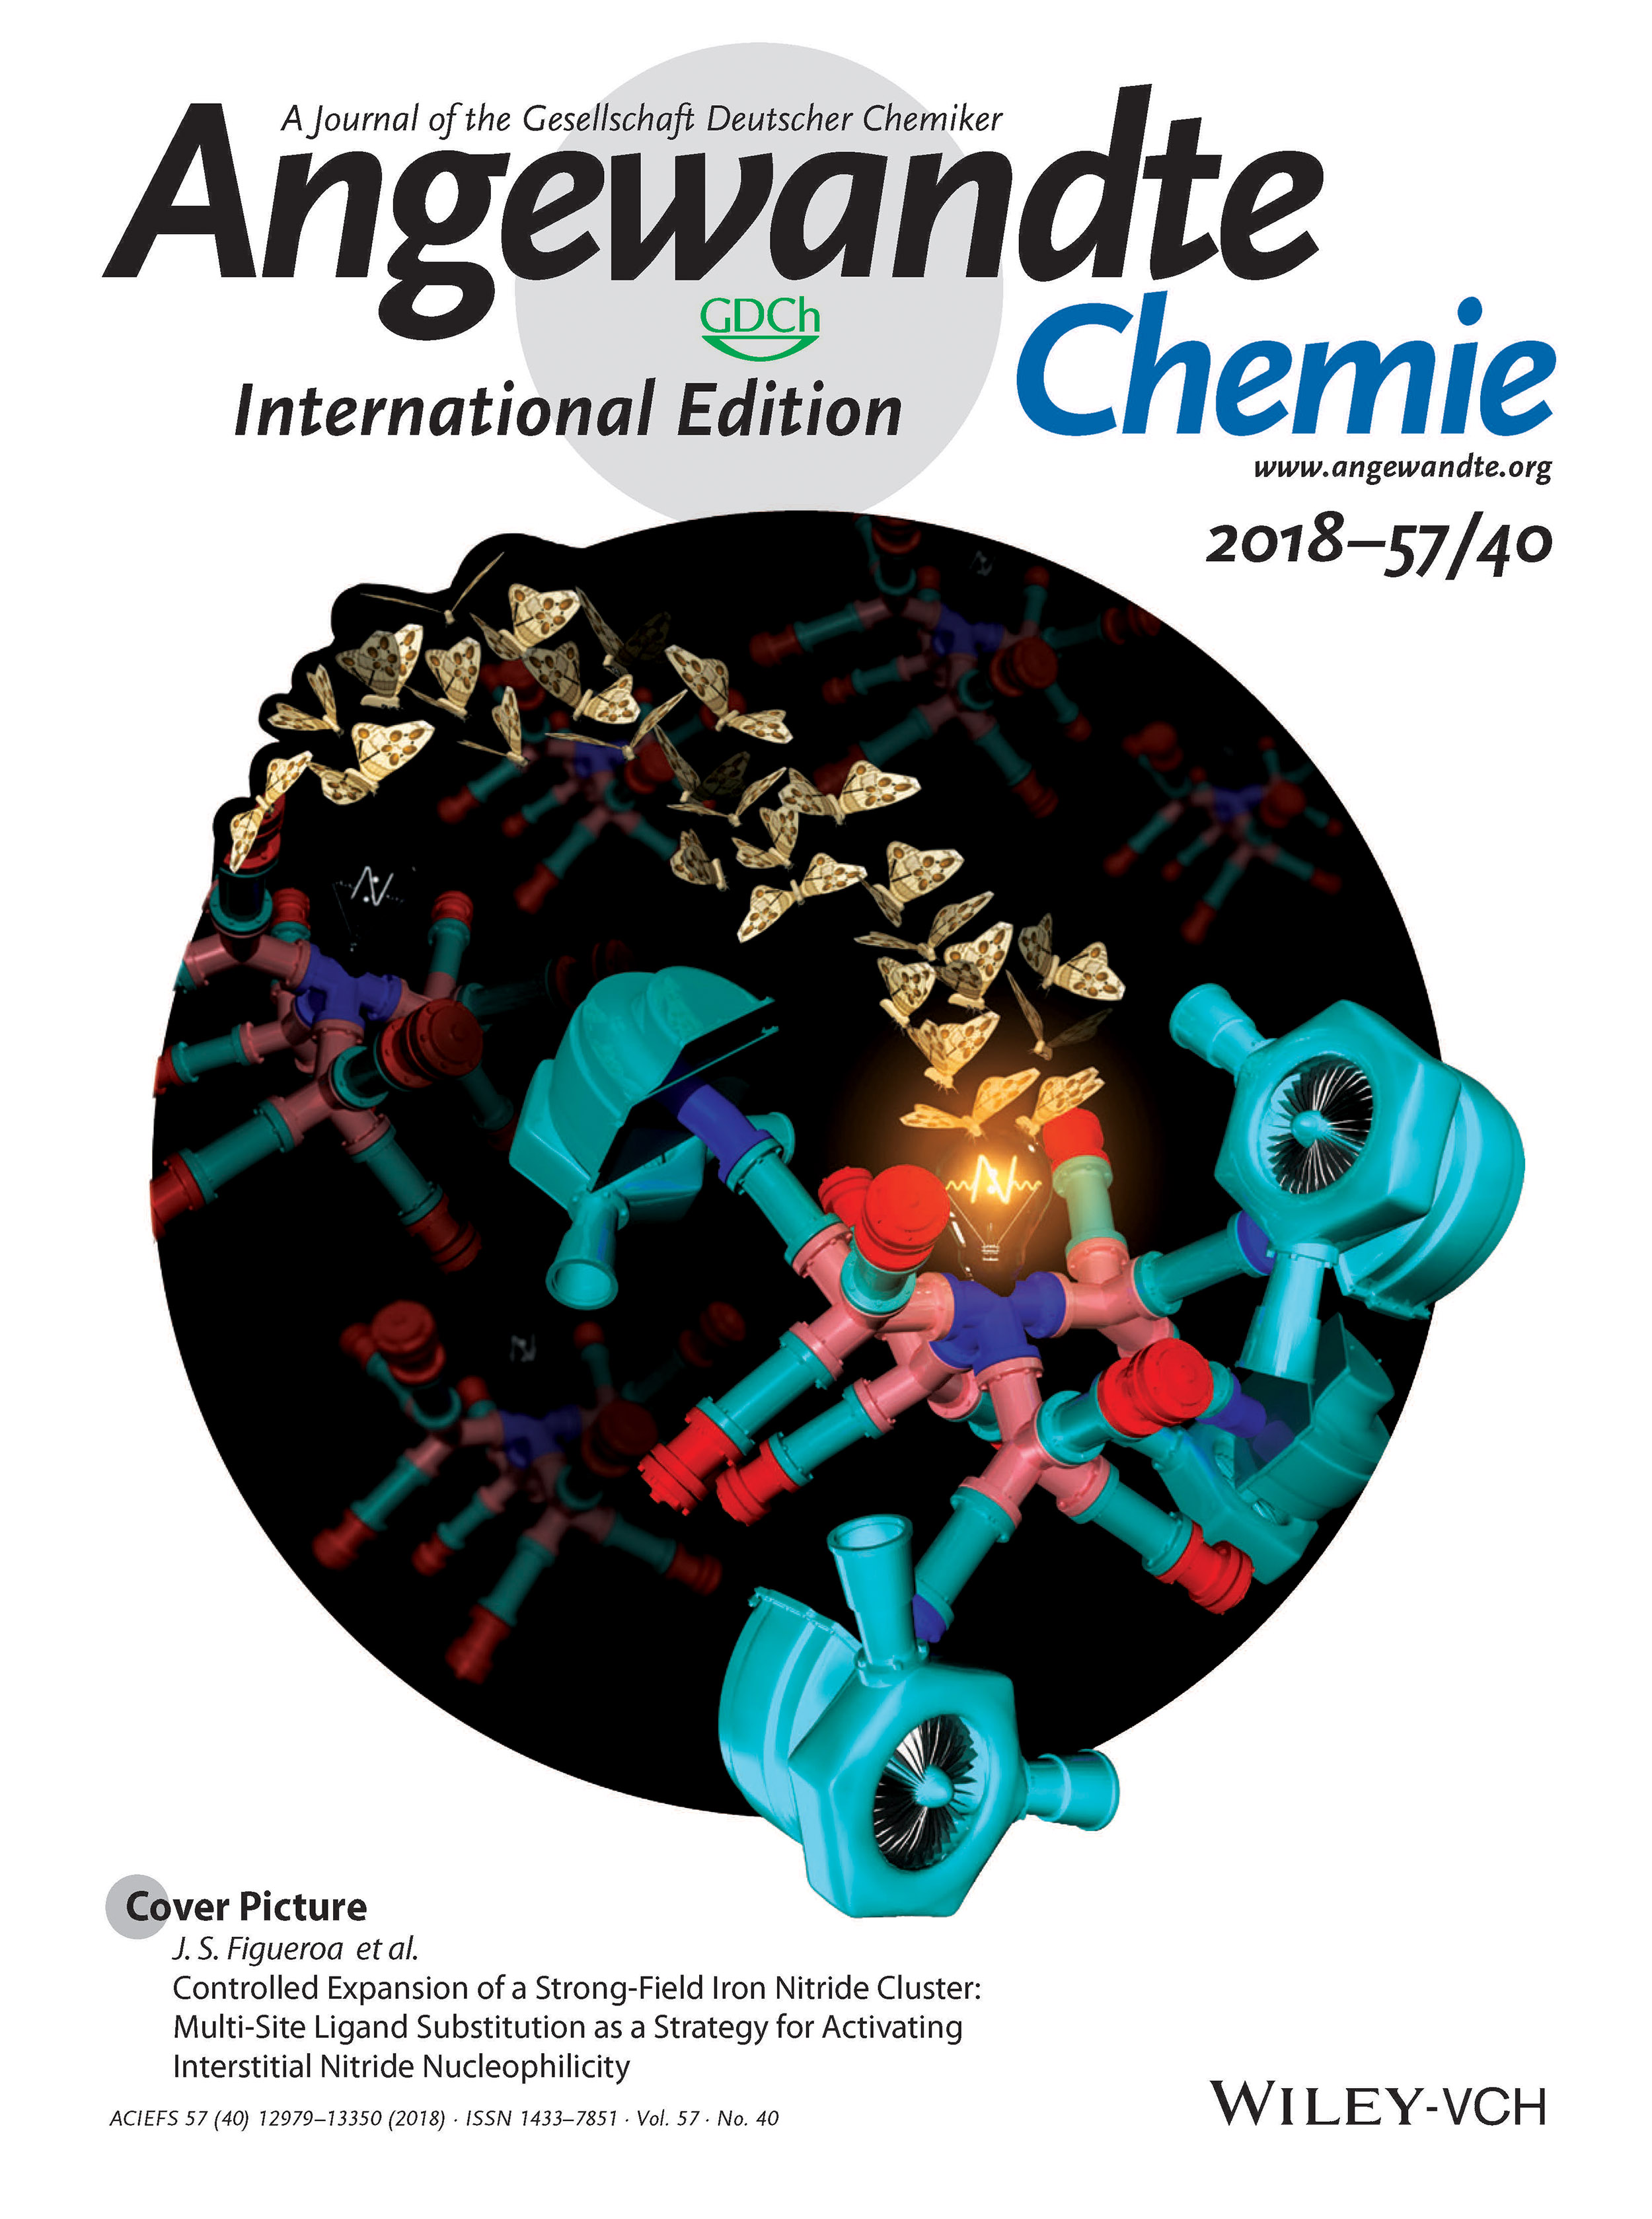 Drance_et_al-2018-Angewandte_Chemie_International_Edition-3.jpg